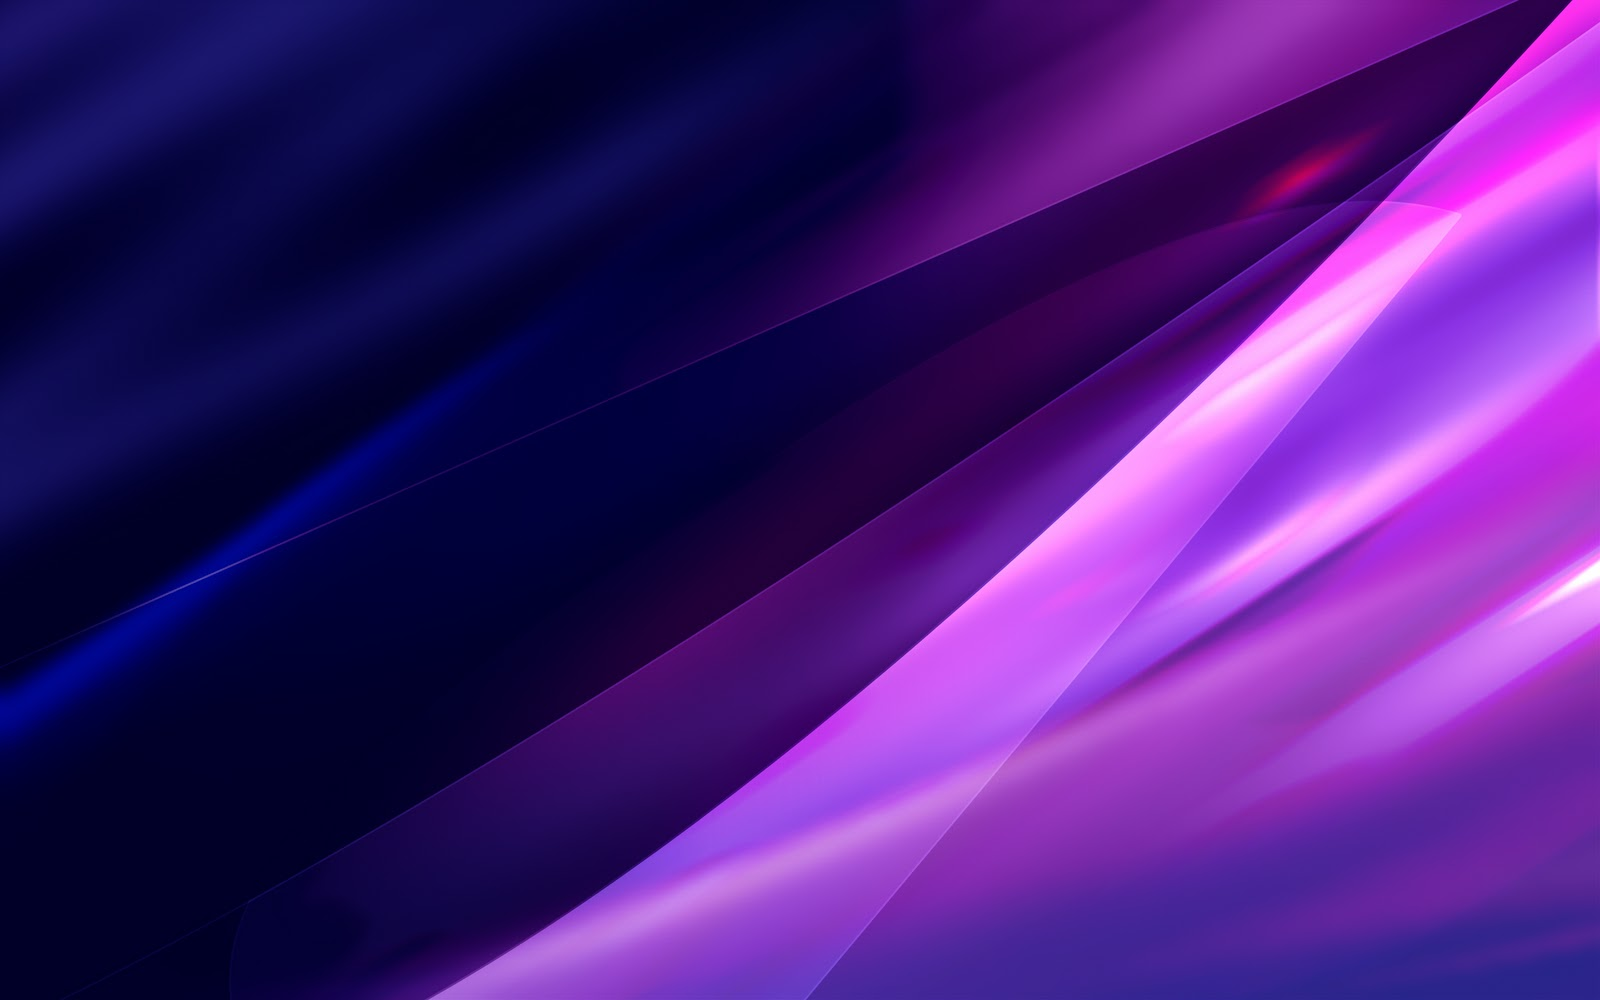 Purple Wallpaper For Phones: 15 Stunning HD Purple Wallpapers